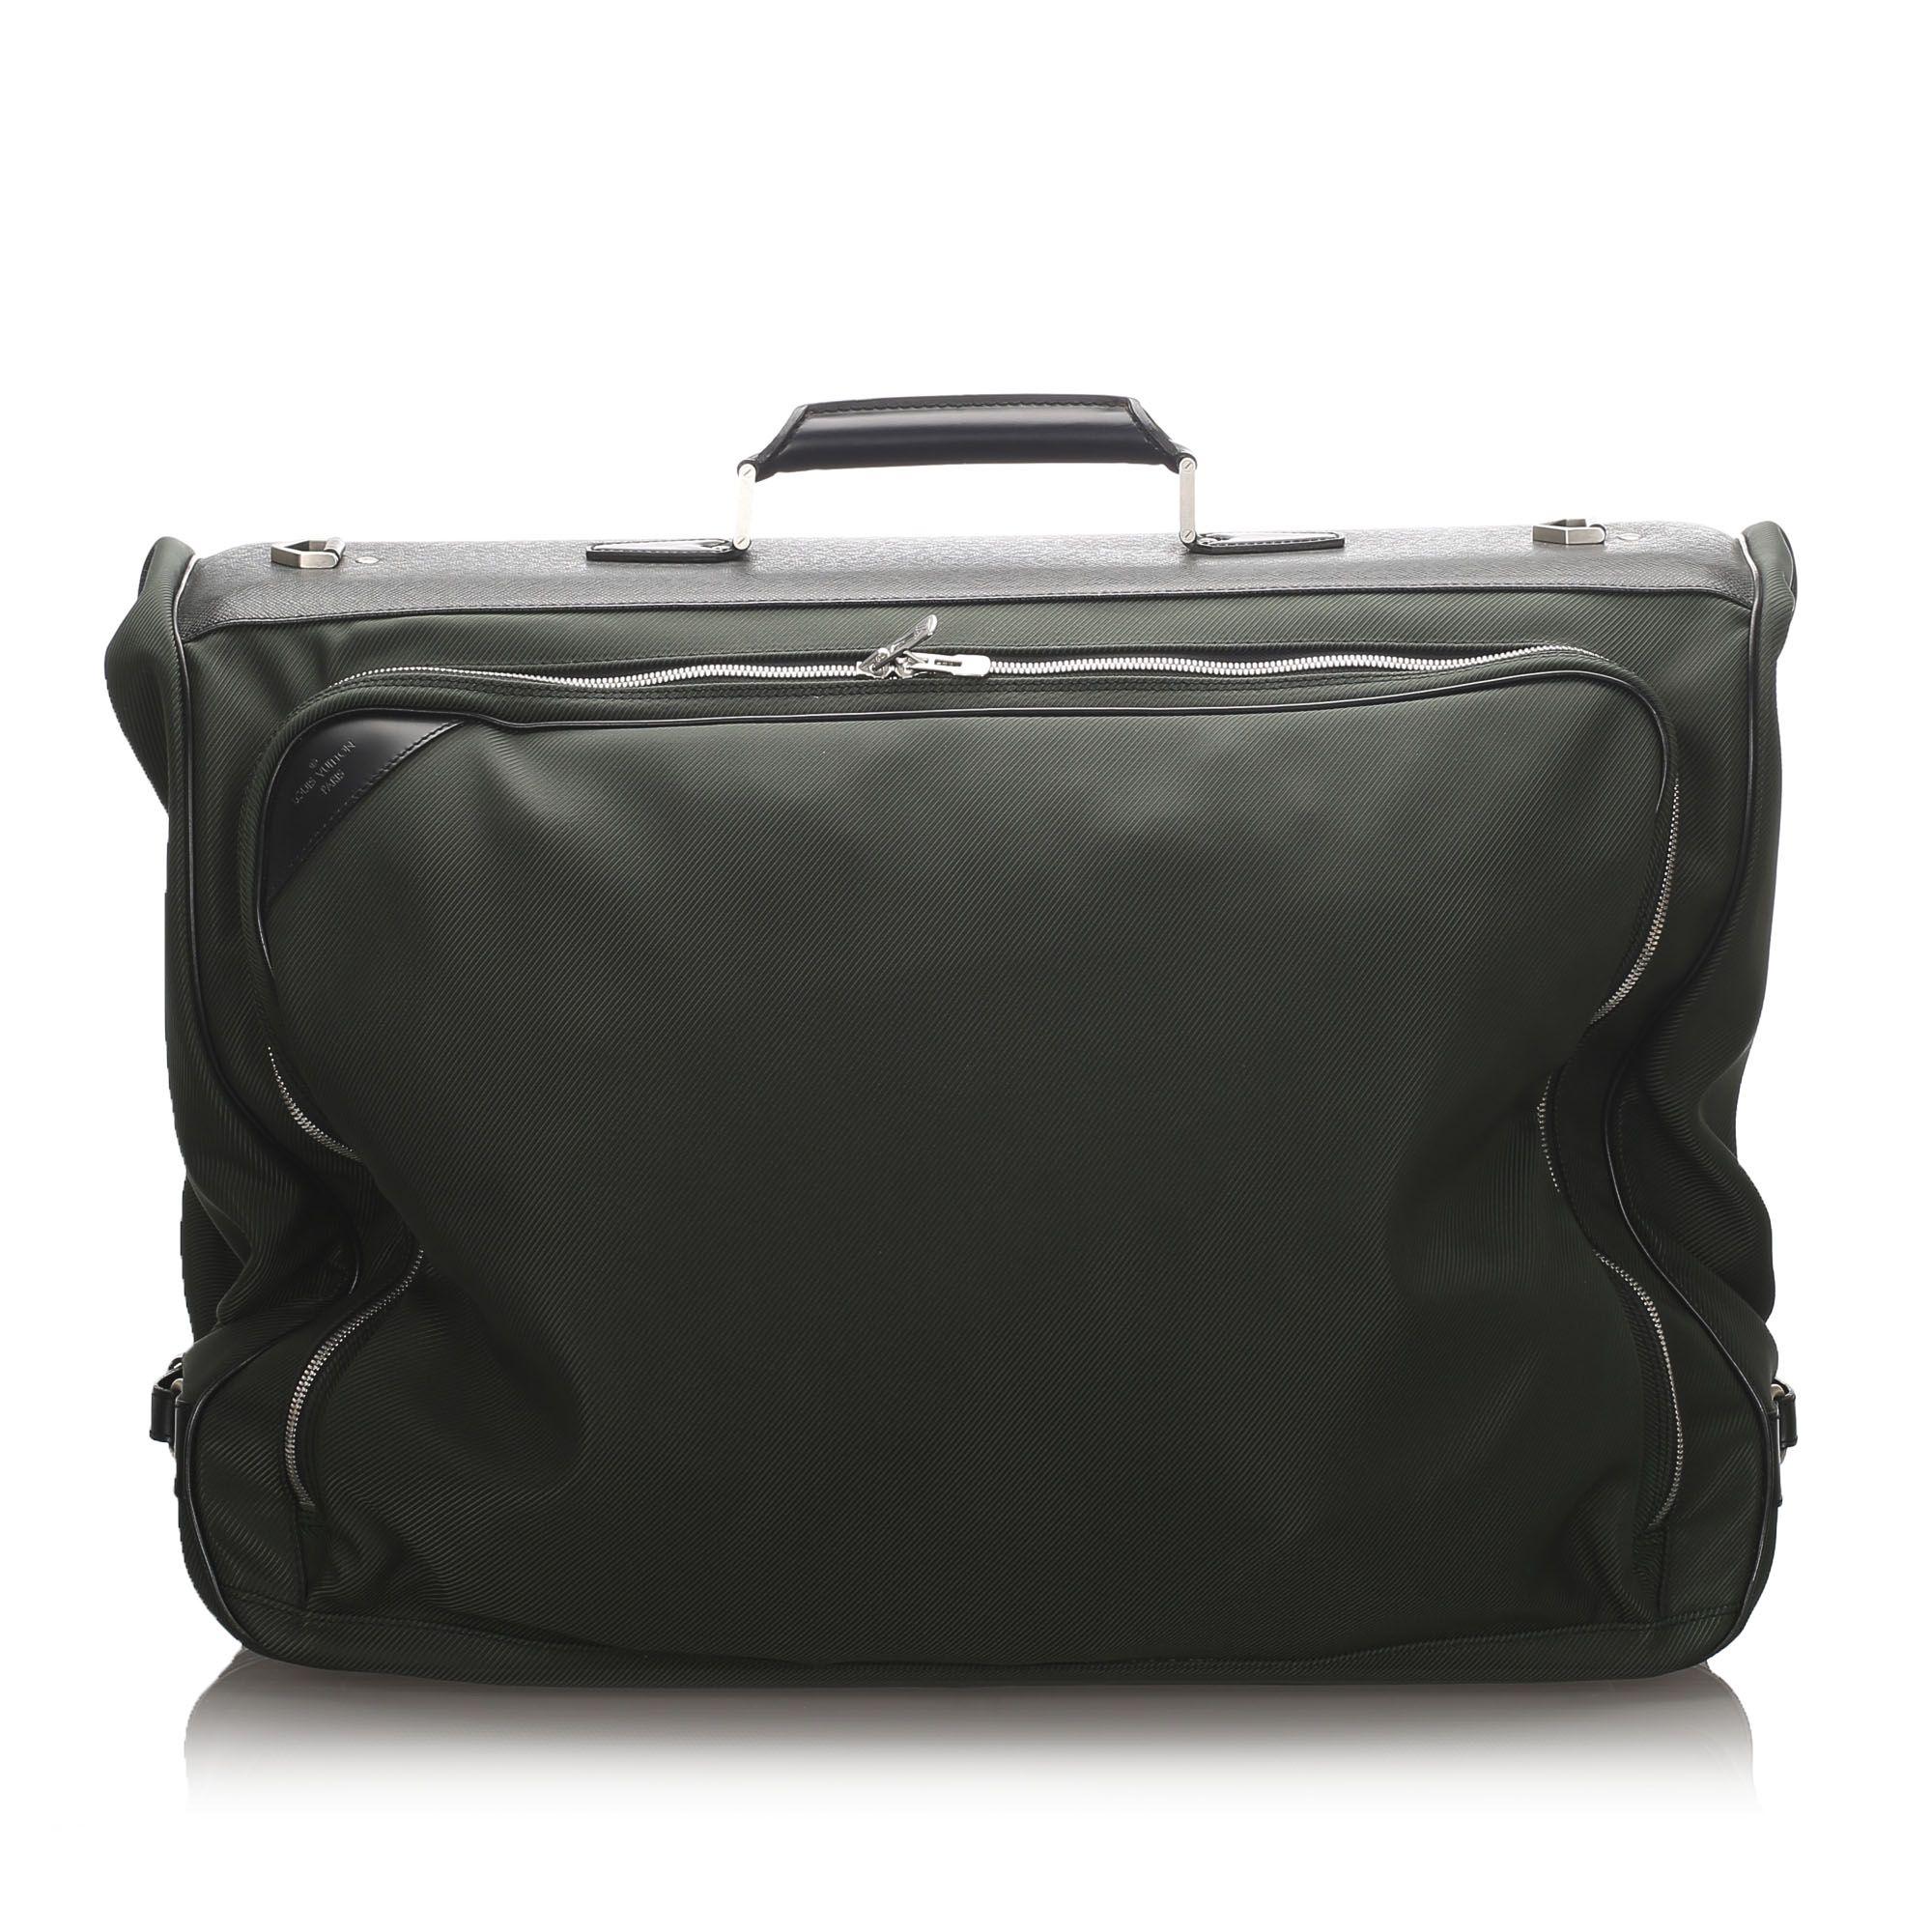 Vintage Louis Vuitton Santore Ardoise Garment Travel Bag Green